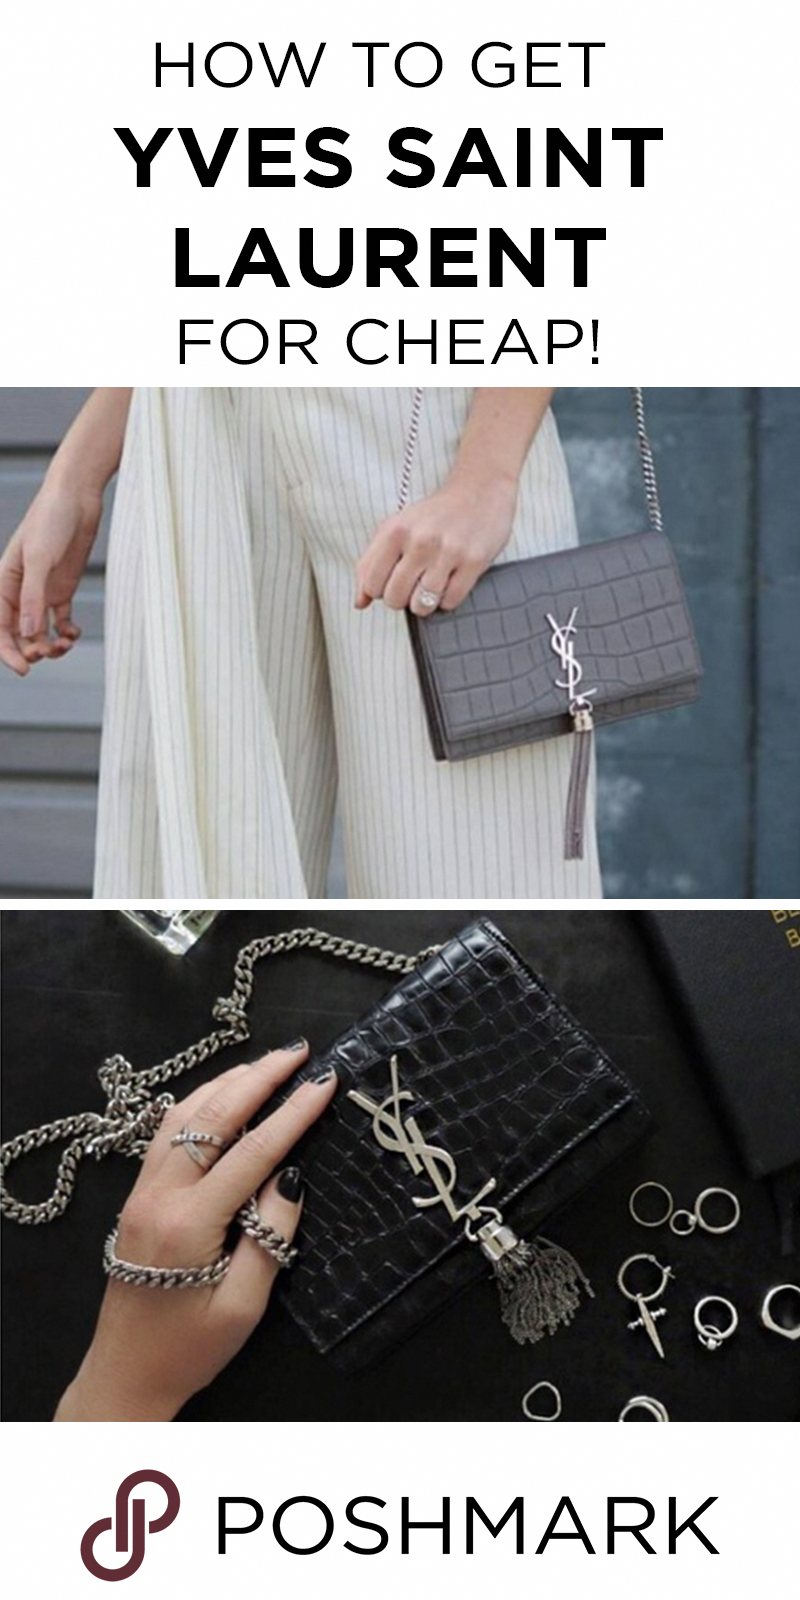 e0d528c7ab8 Find authentic Yves Saint Laurent bags on Poshmark! Download the app today.   Designerhandbags